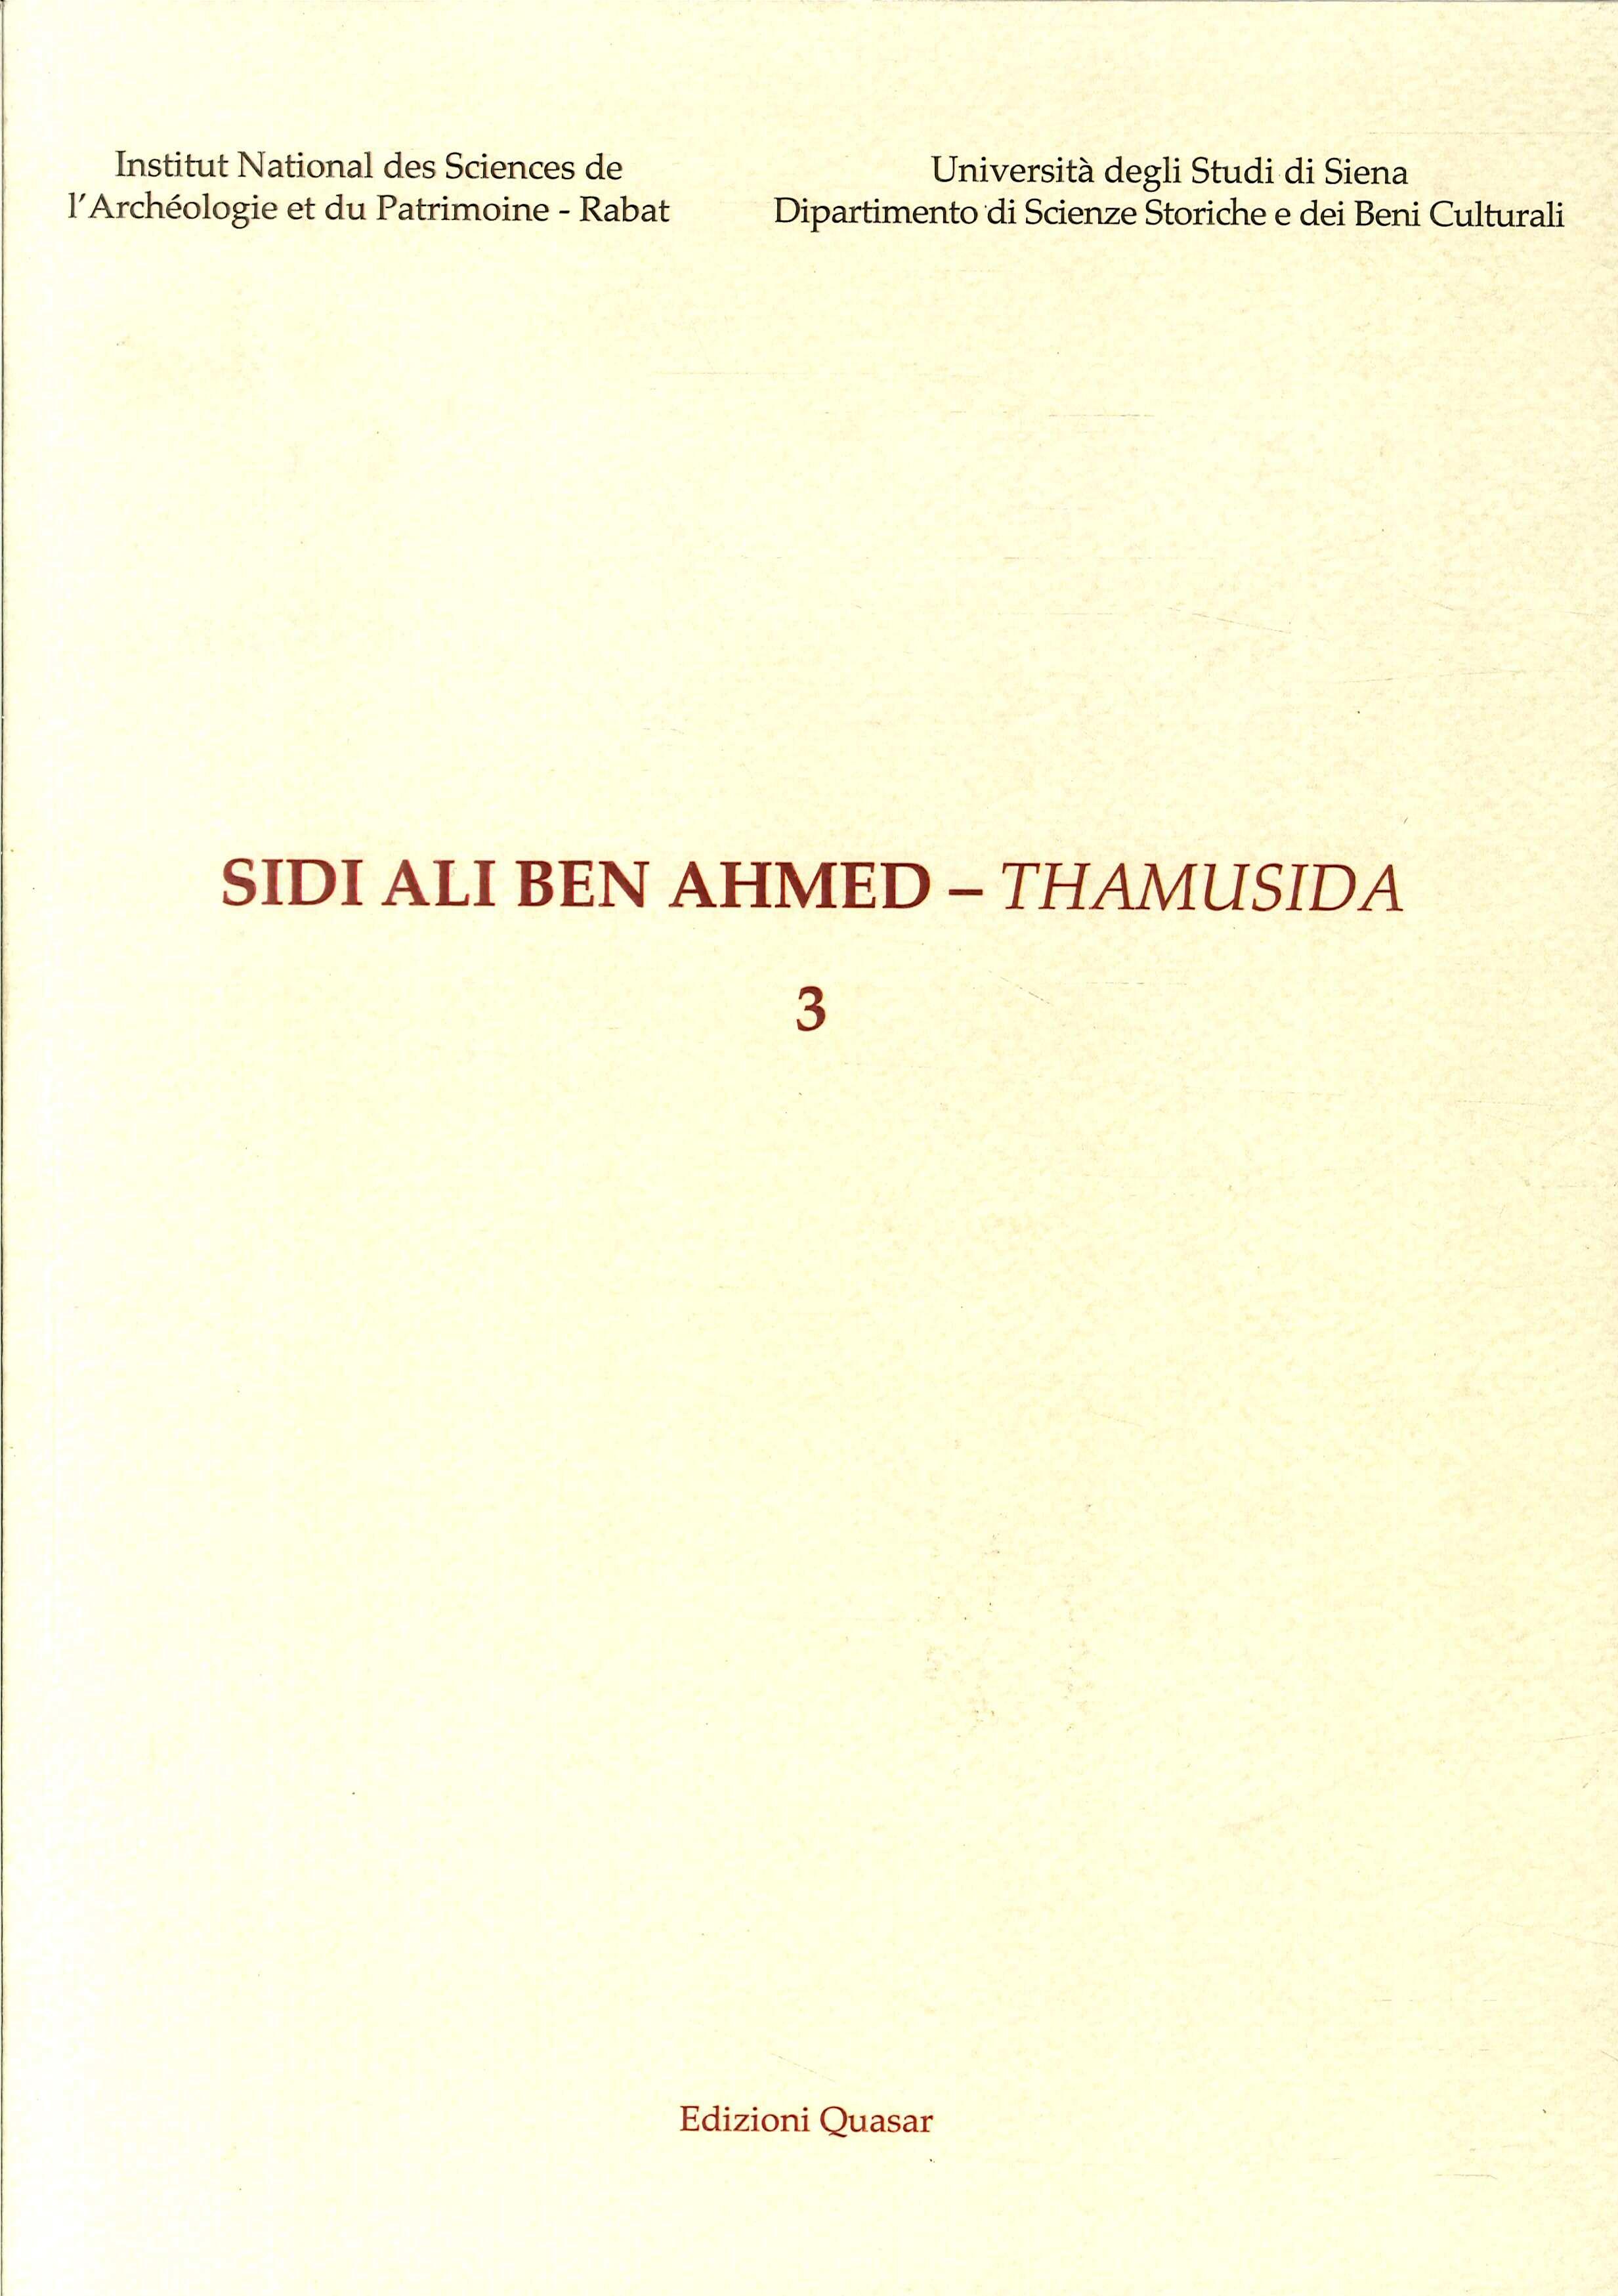 Sidi Ali Ben Ahmed. Thamusida. Vol. 3: I materiali. Le matériel.